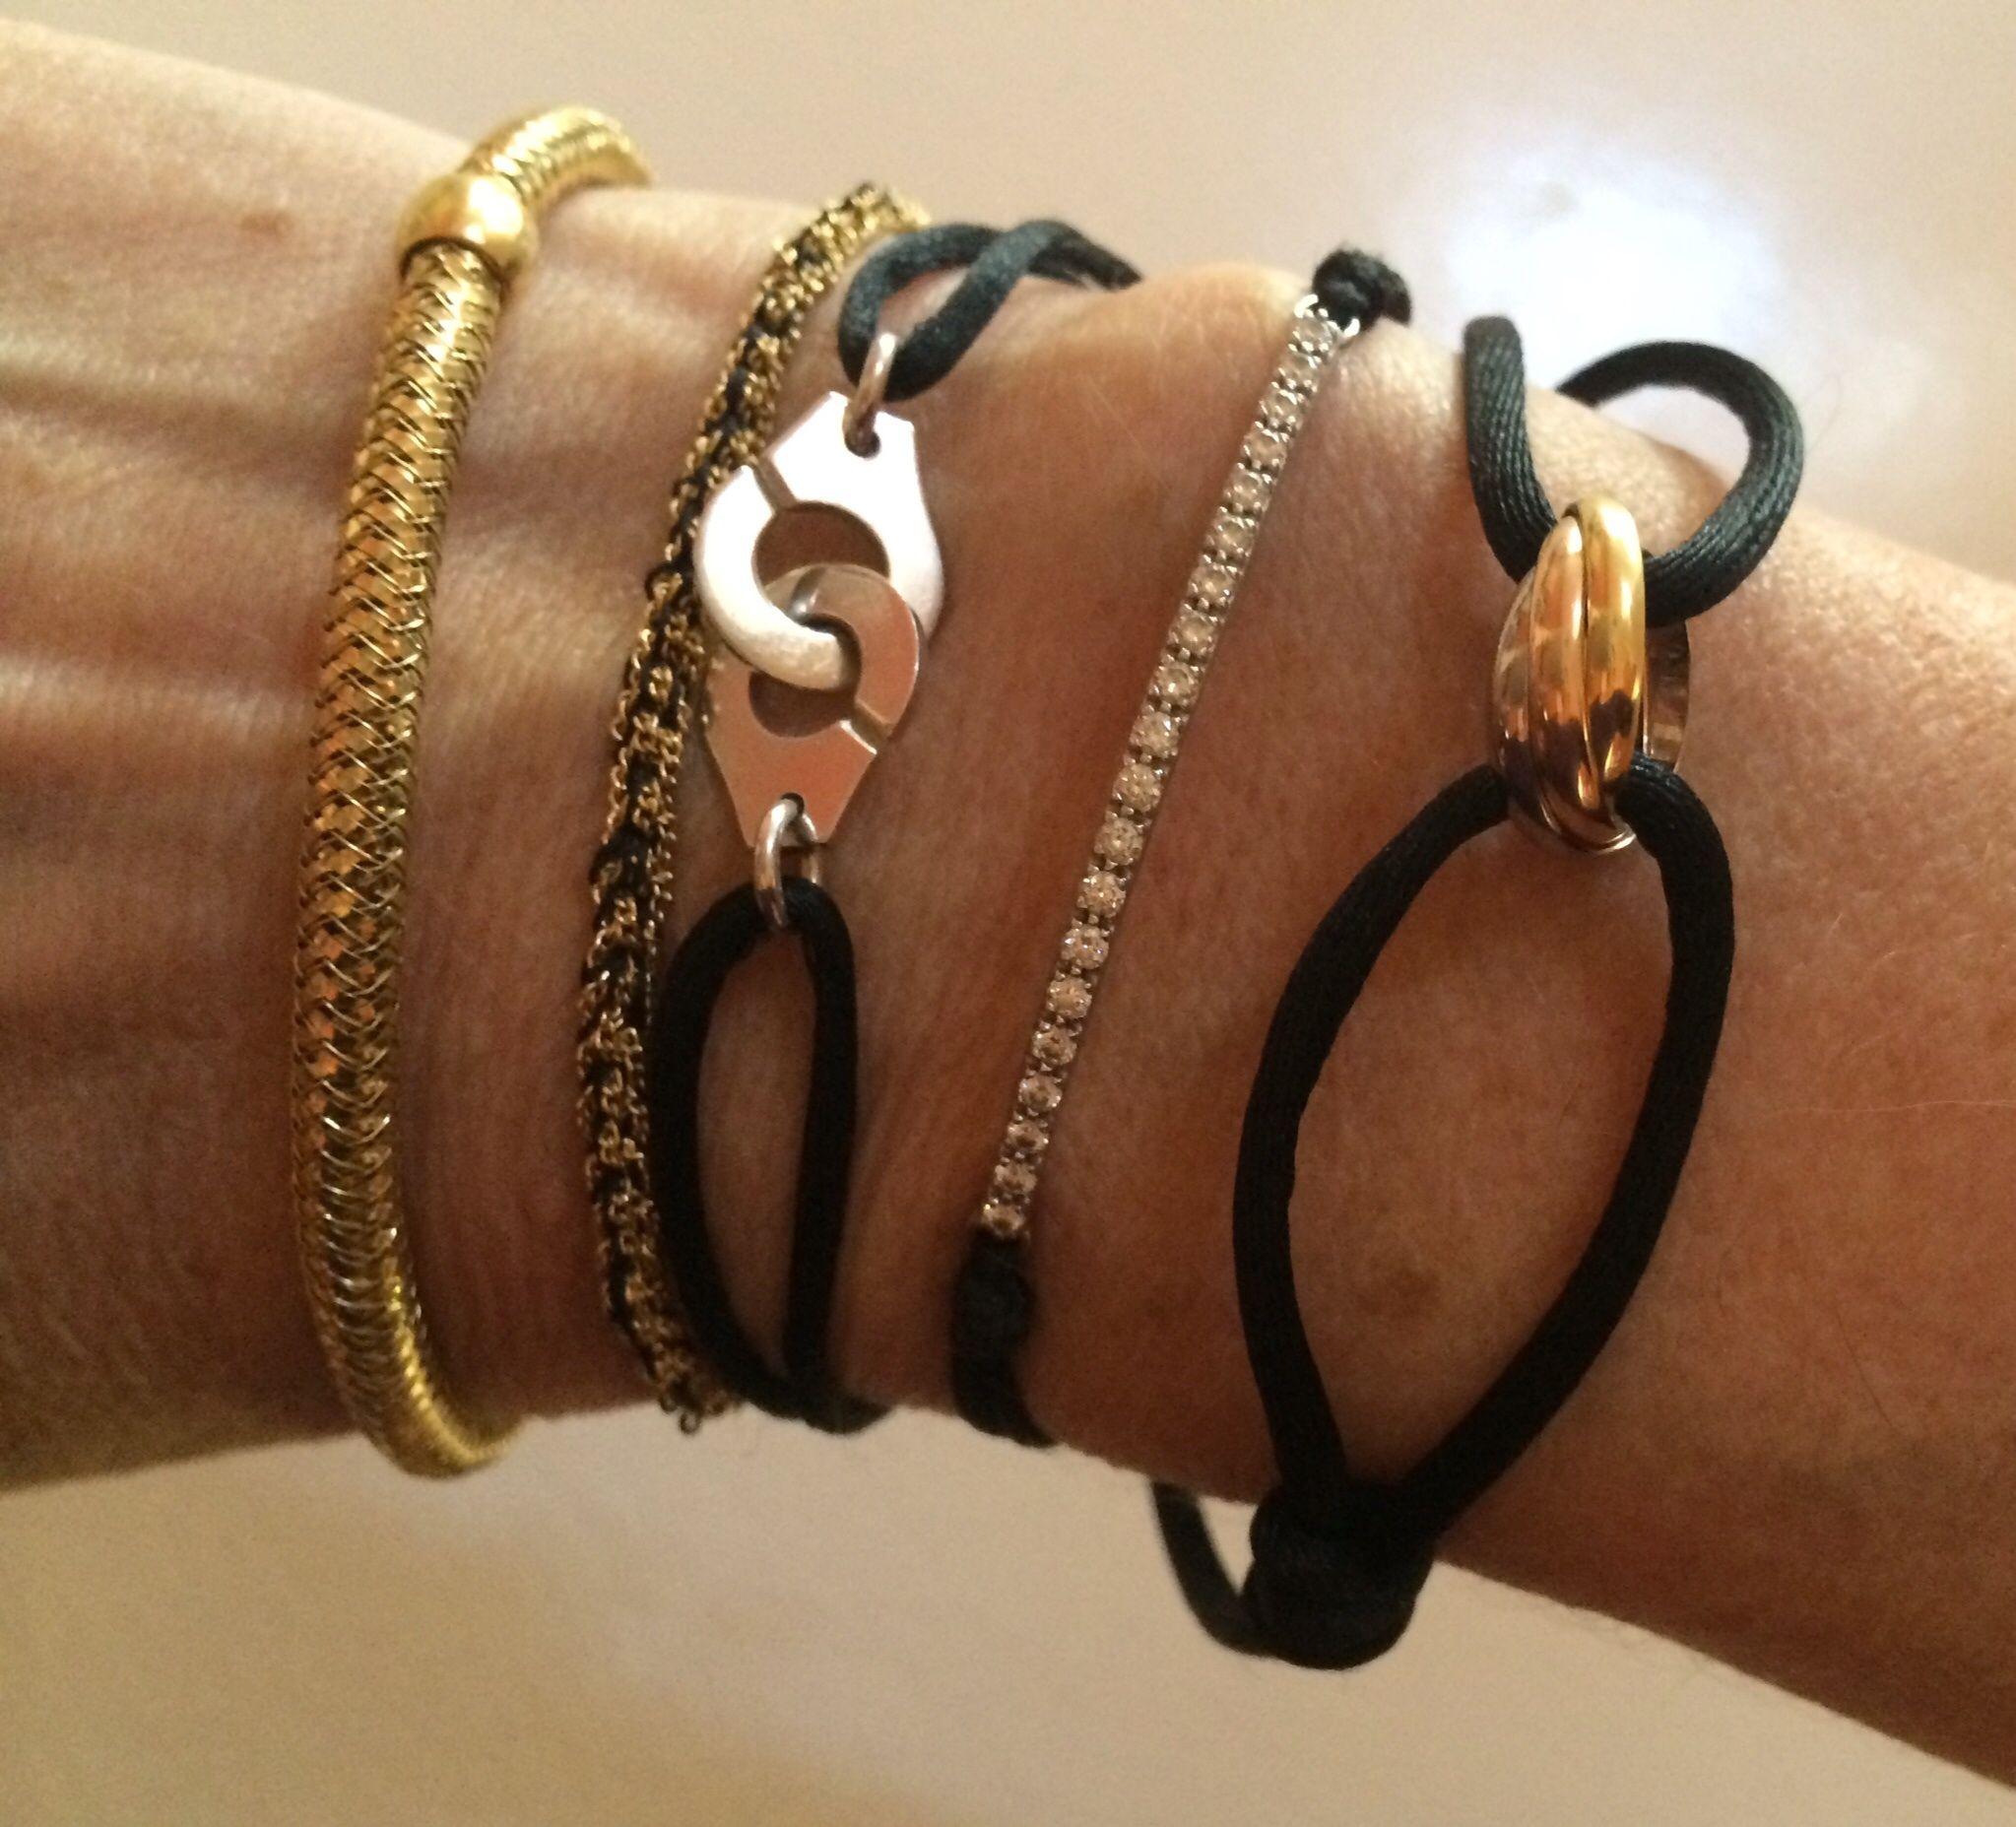 694c809acd56 Roberto Coin Primavera bracelet, Carolina Bucci Health bracelet, Dinh Van  Menottes bracelet, Tiffany Metro bracelet, Cartier Trinity bracelet